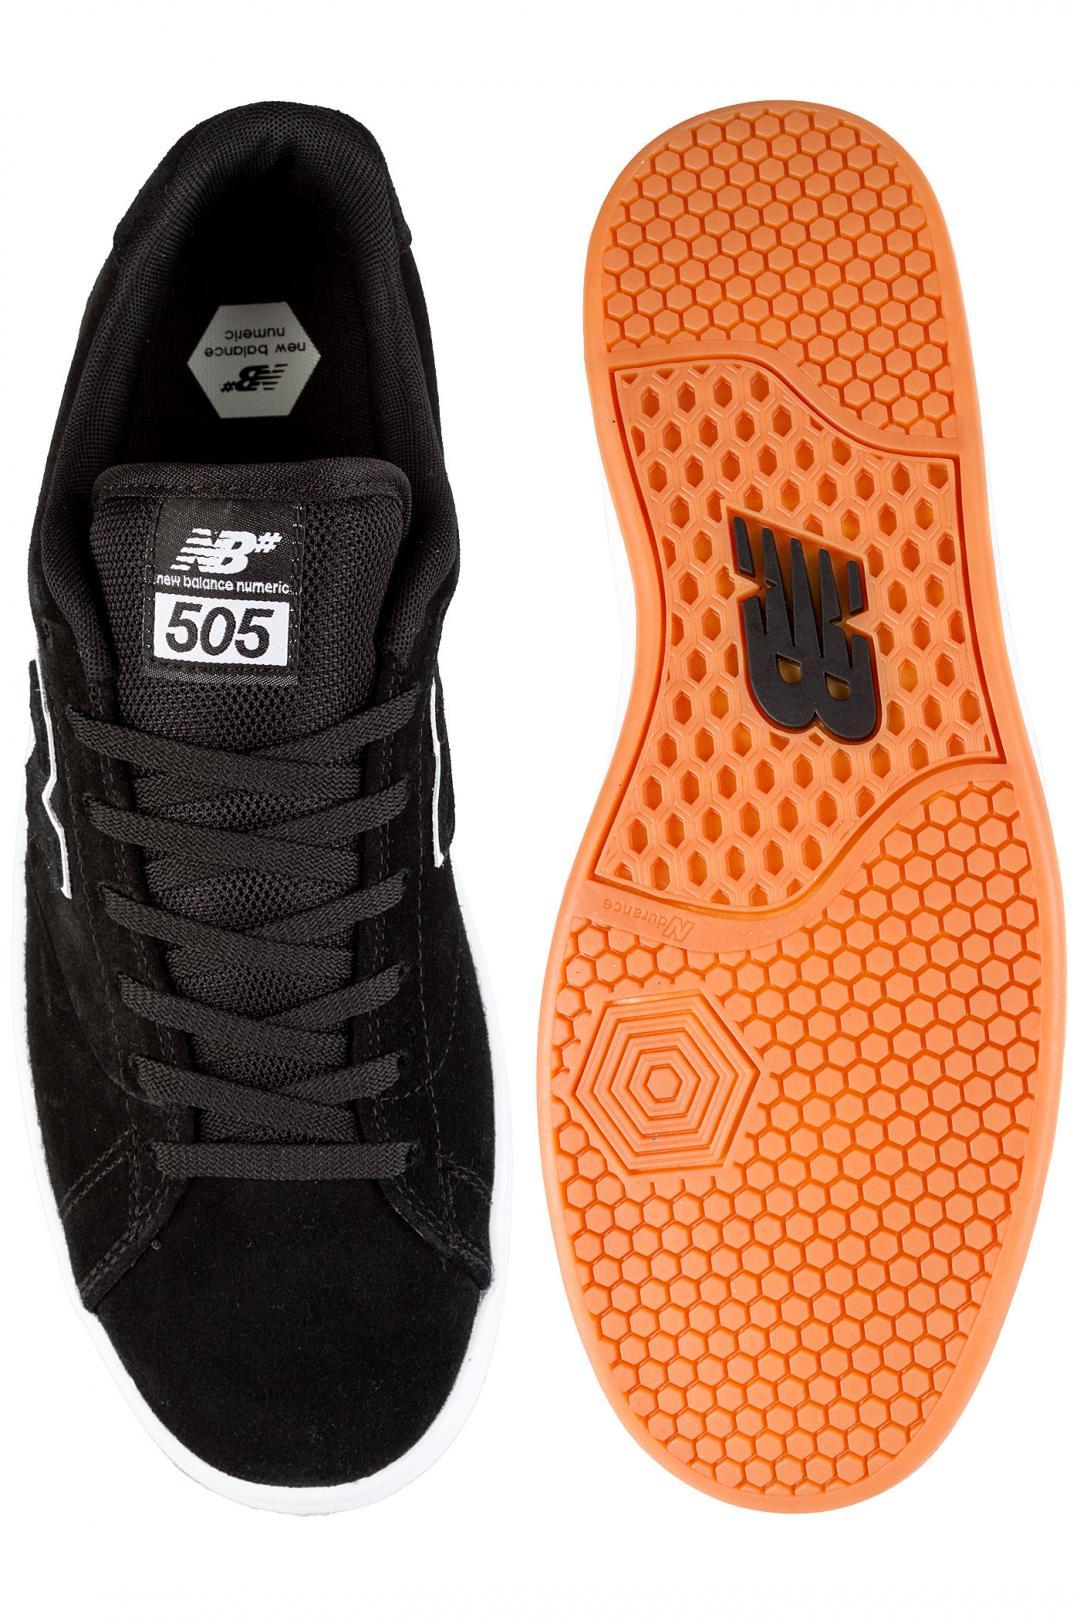 Uomo New Balance Numeric 505 black white   Sneakers low top